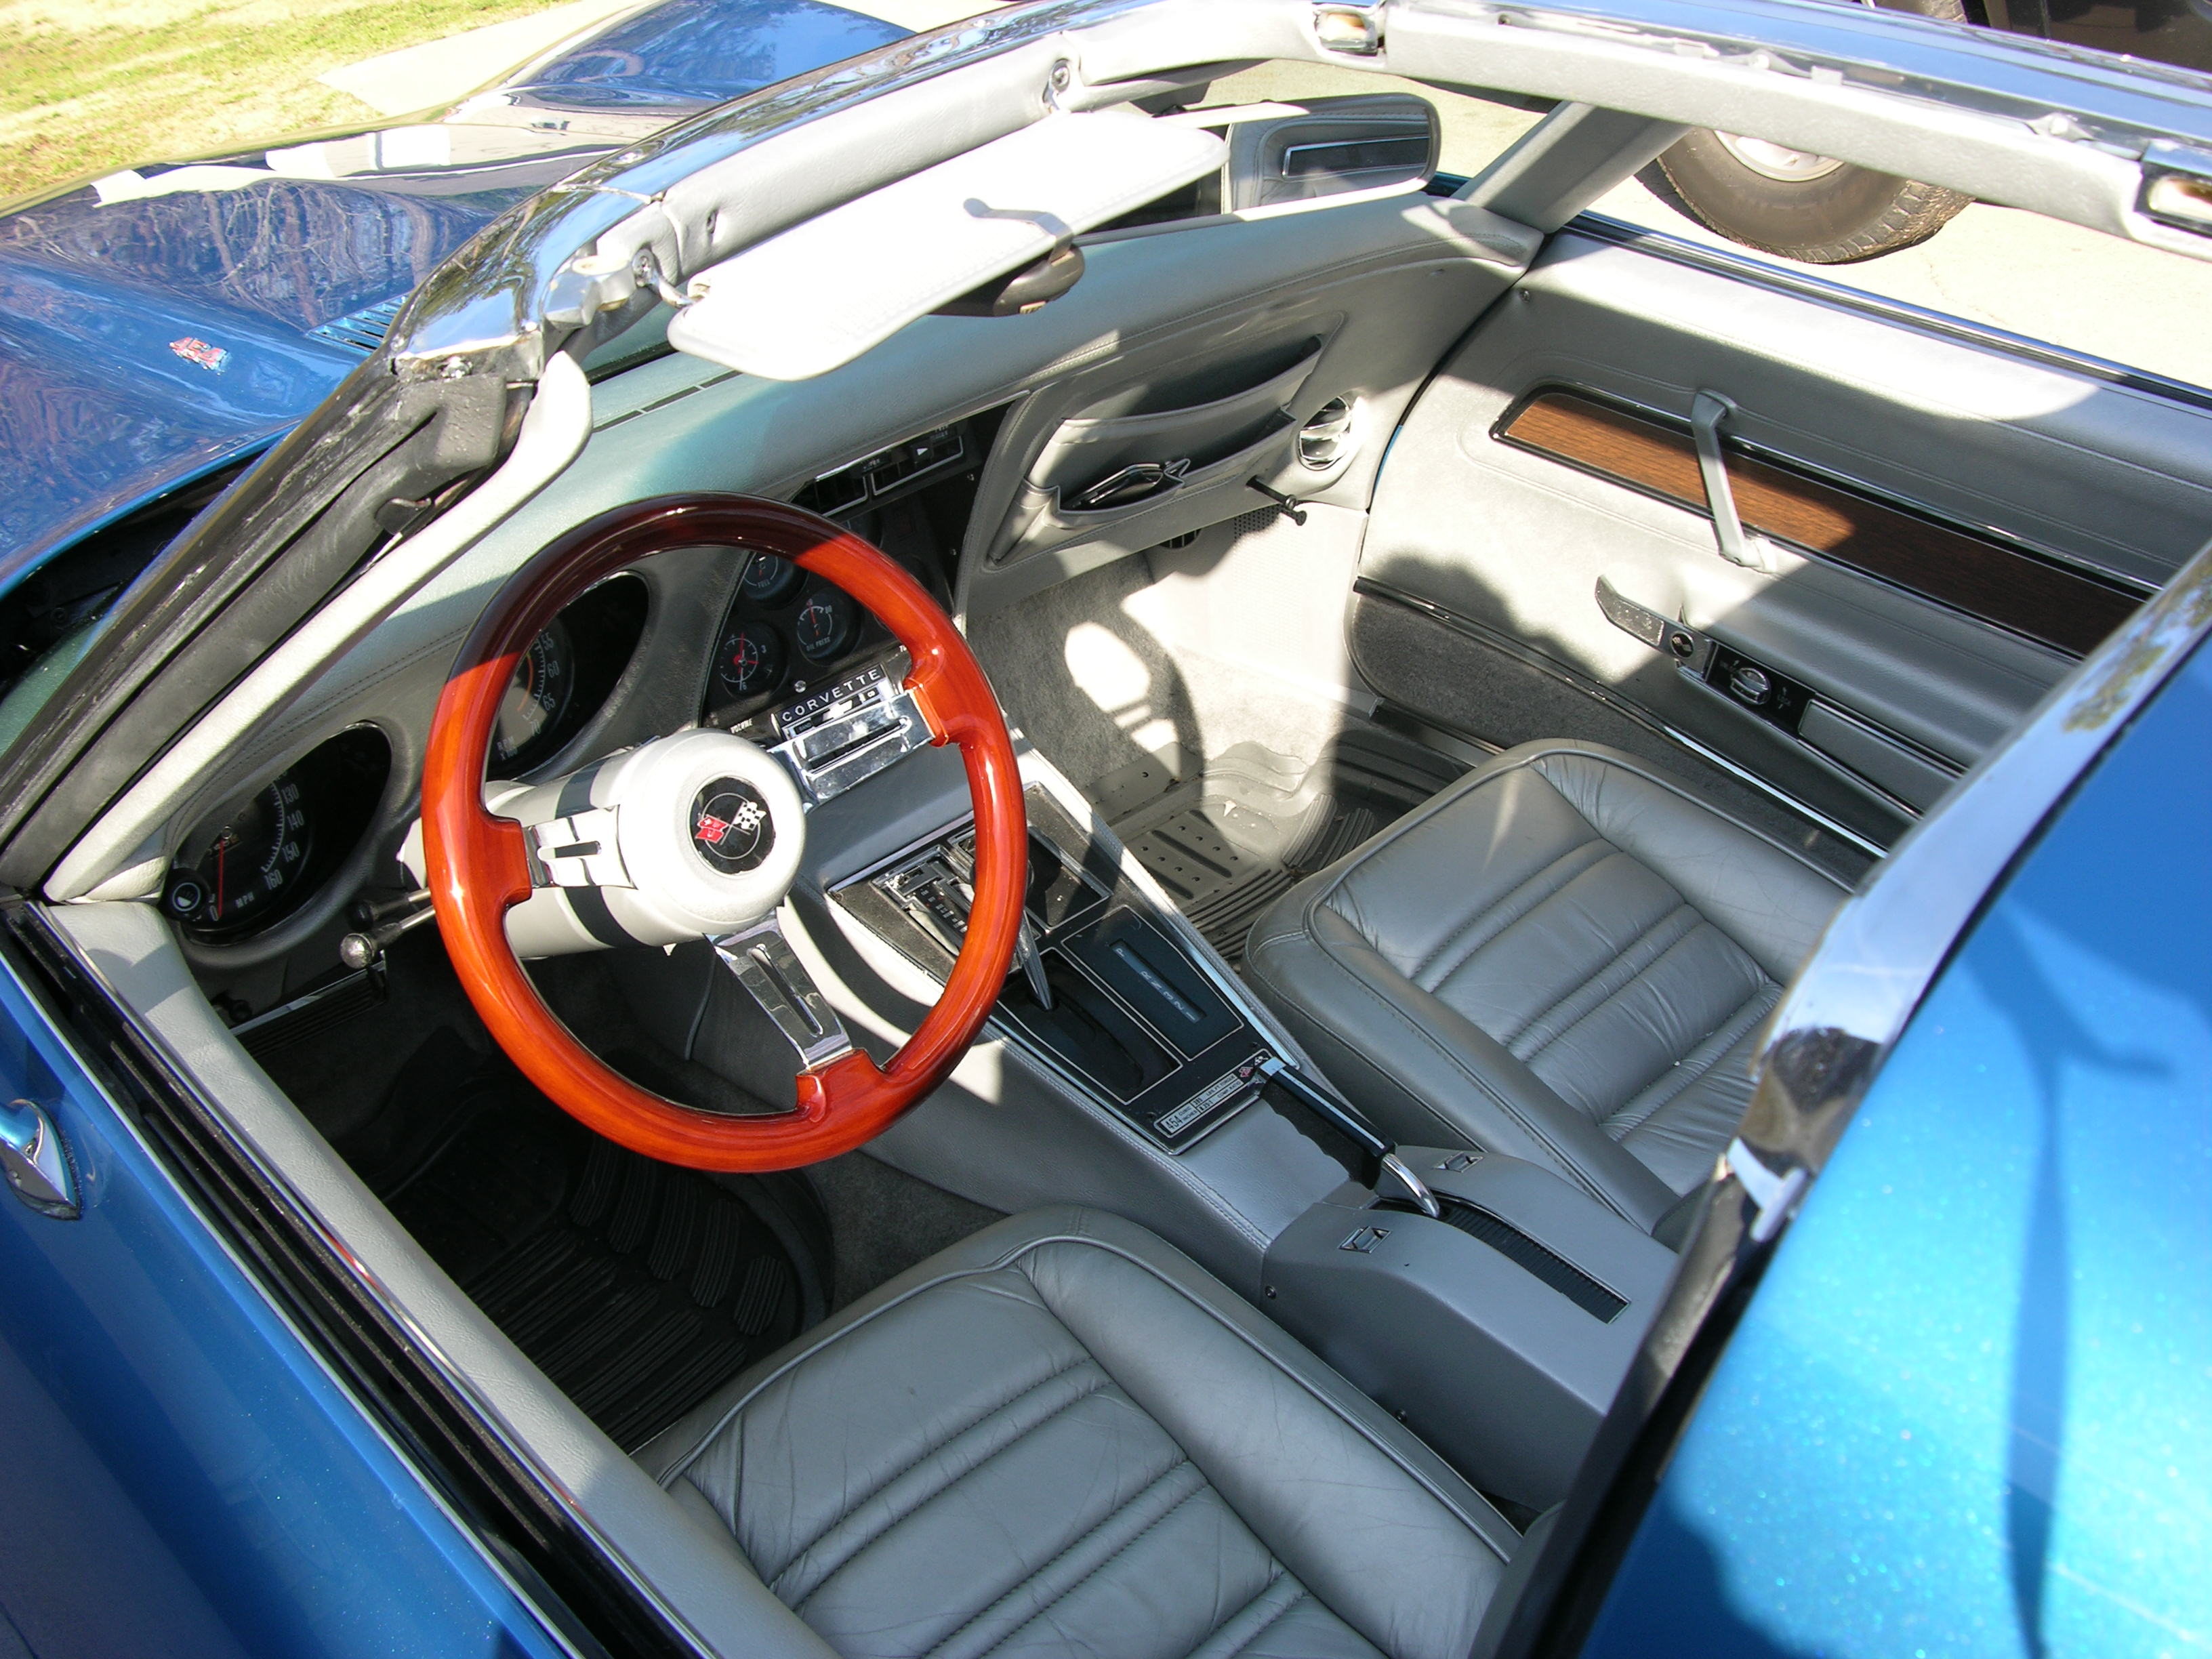 Click image for larger version  Name:corvette 077.jpg Views:976 Size:923.4 KB ID:66804